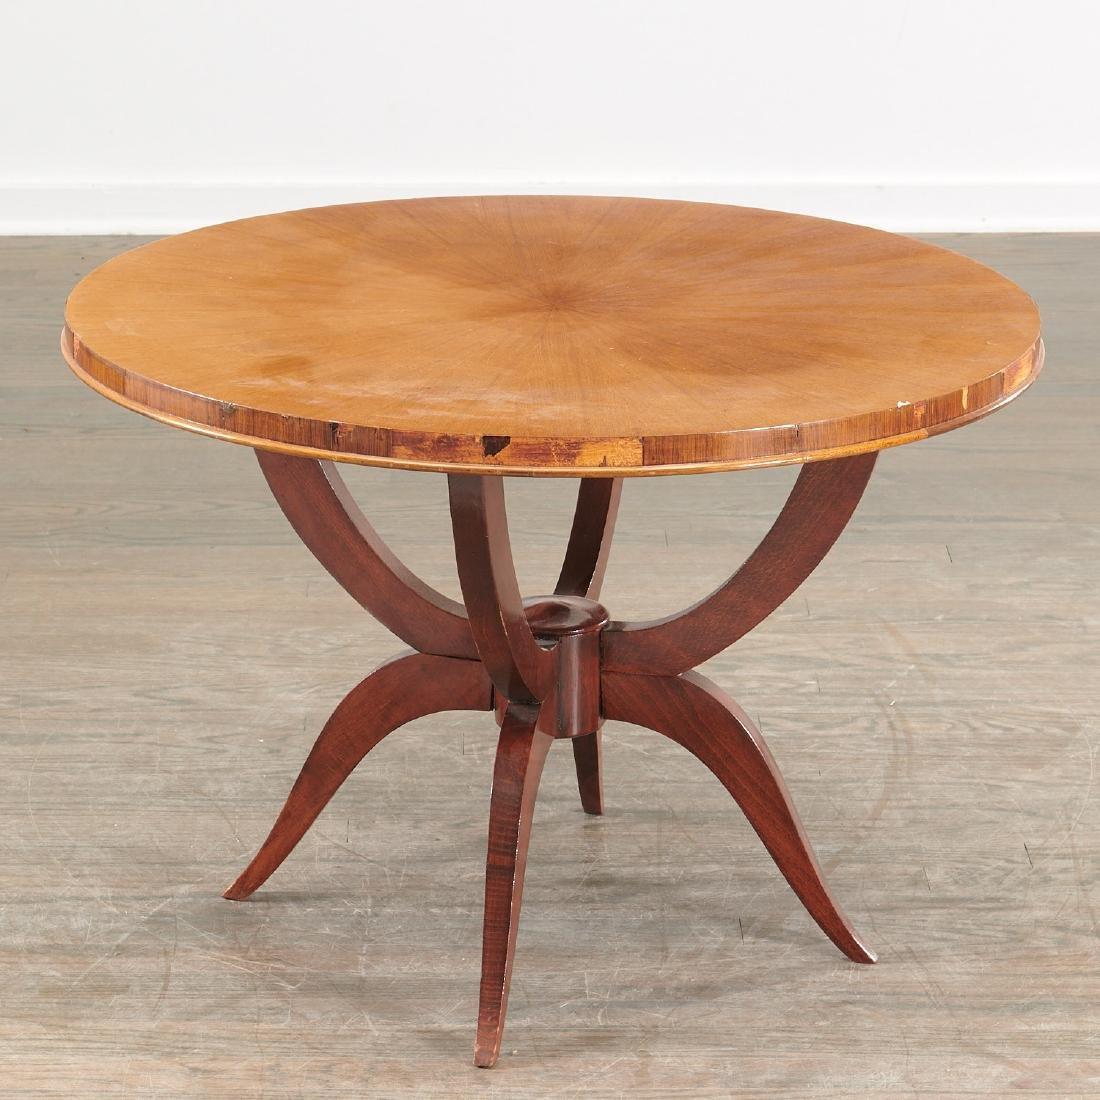 Jules Leleu (attrib.) circular coffee table